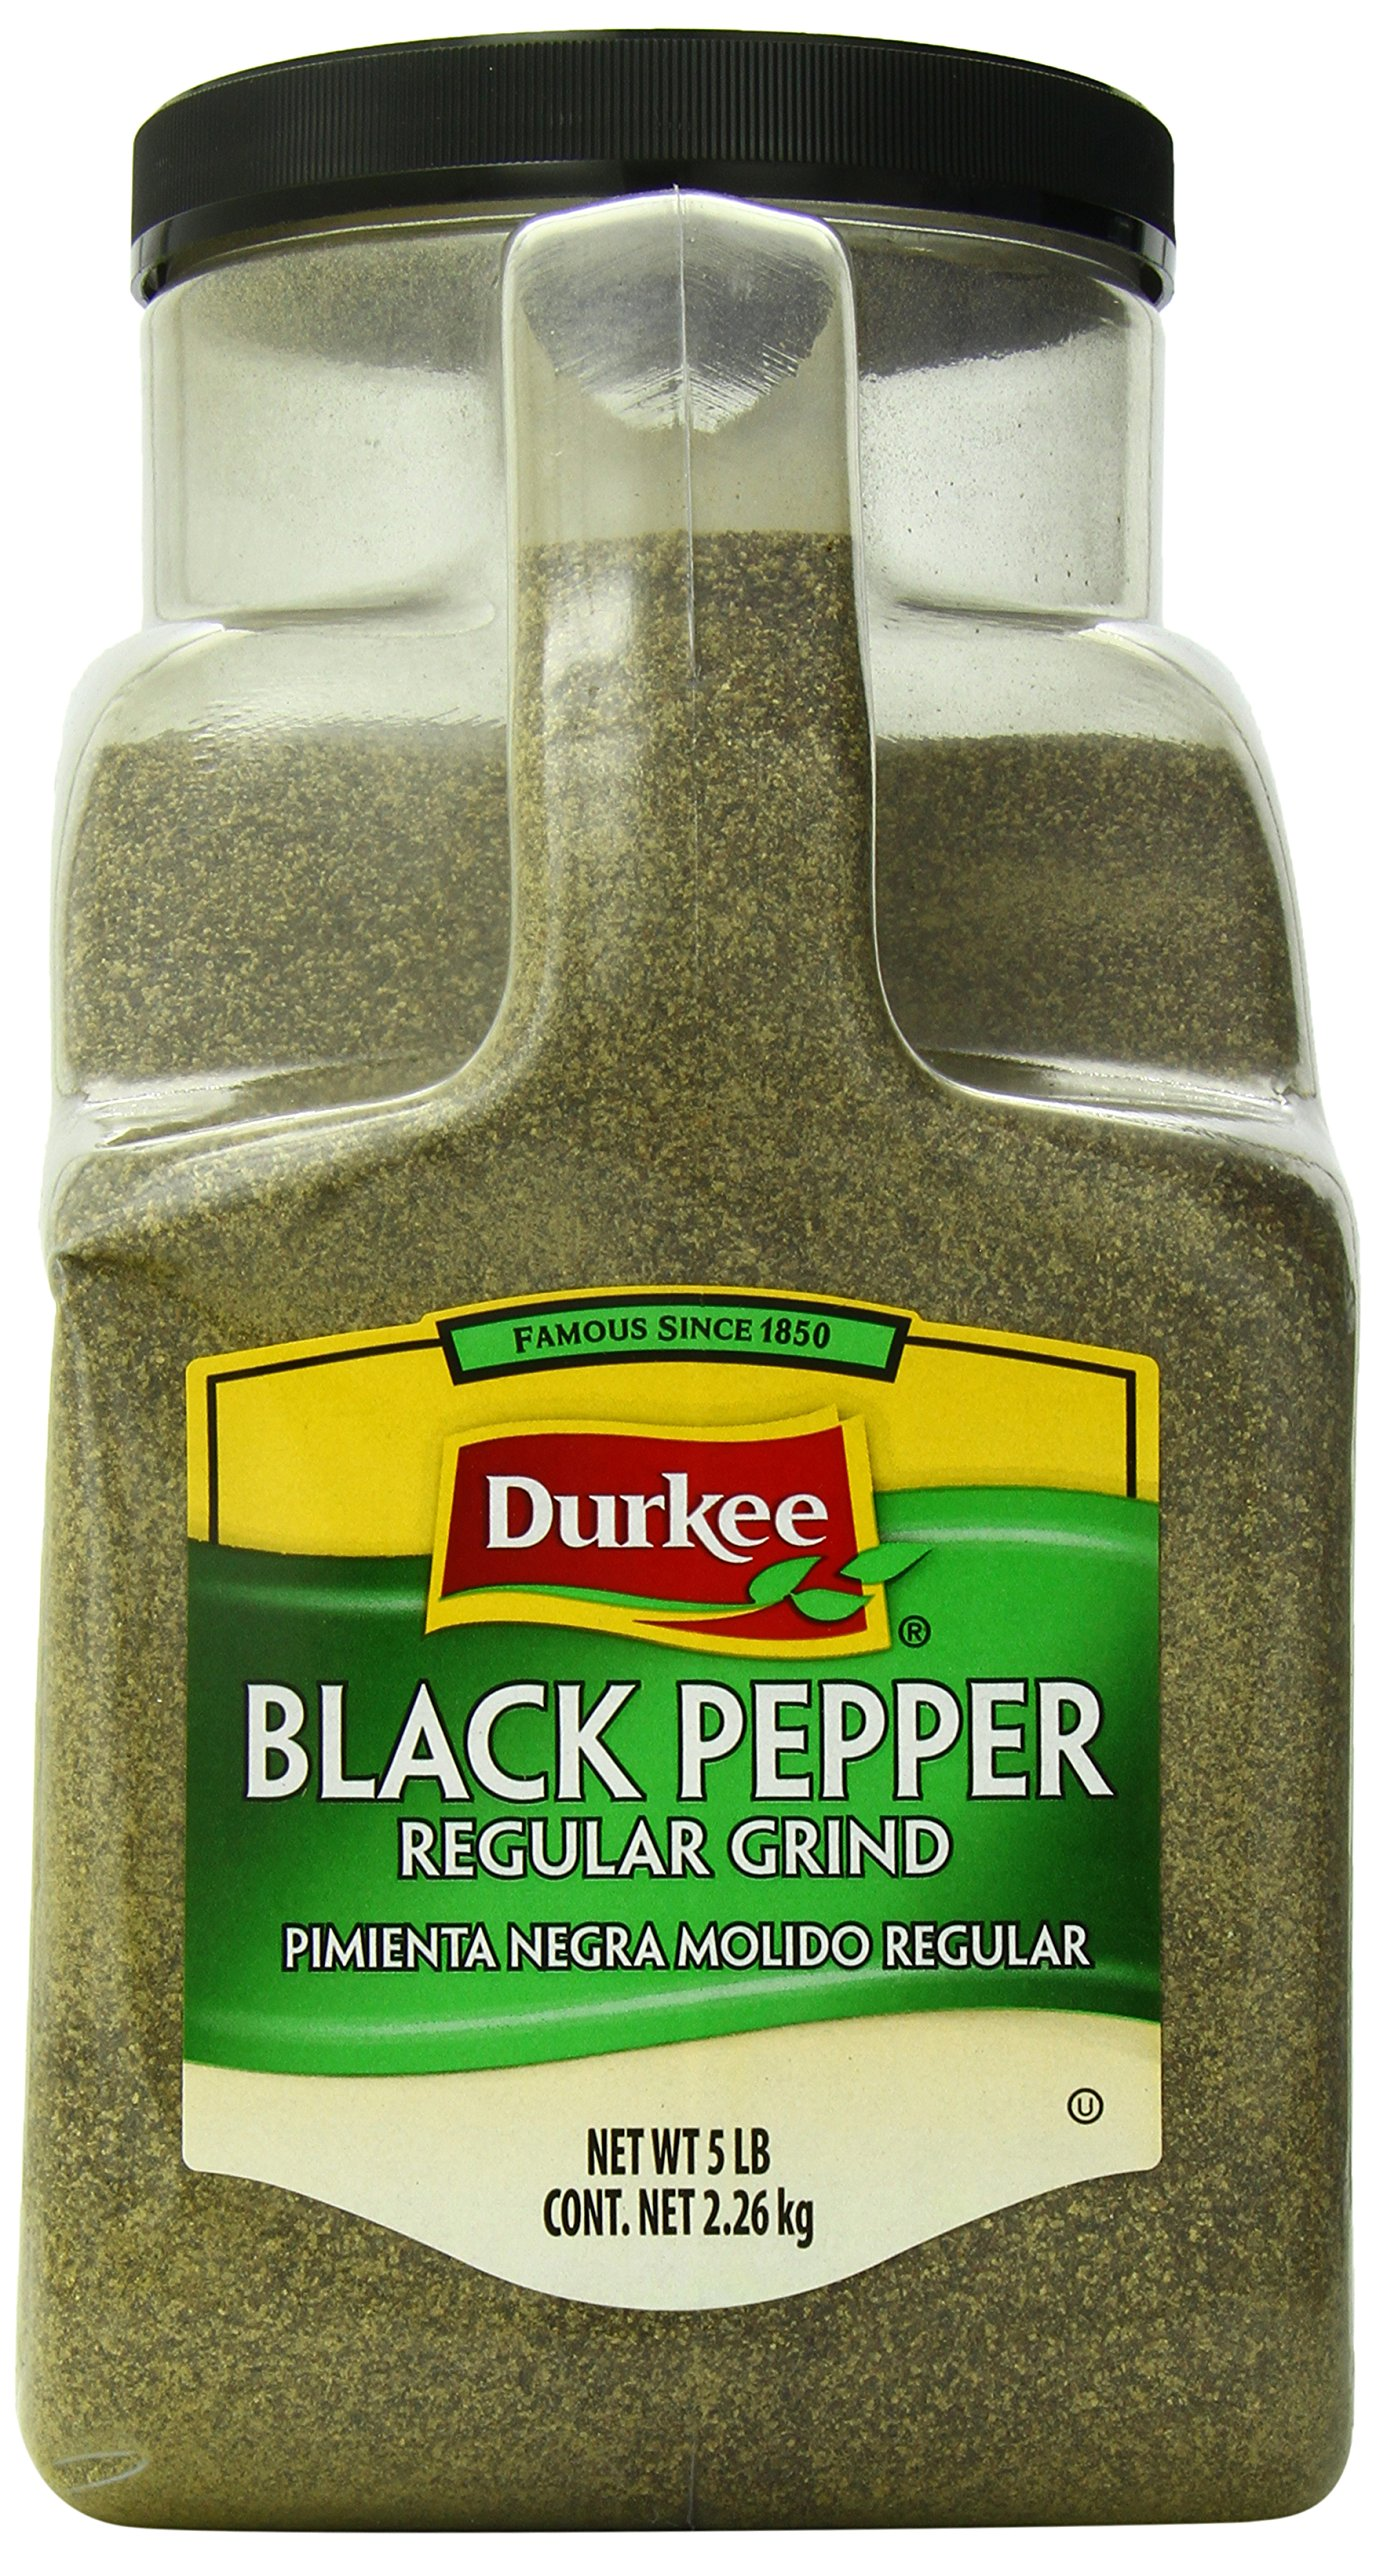 Durkee Black Pepper, Regular Grind, 5-Pound